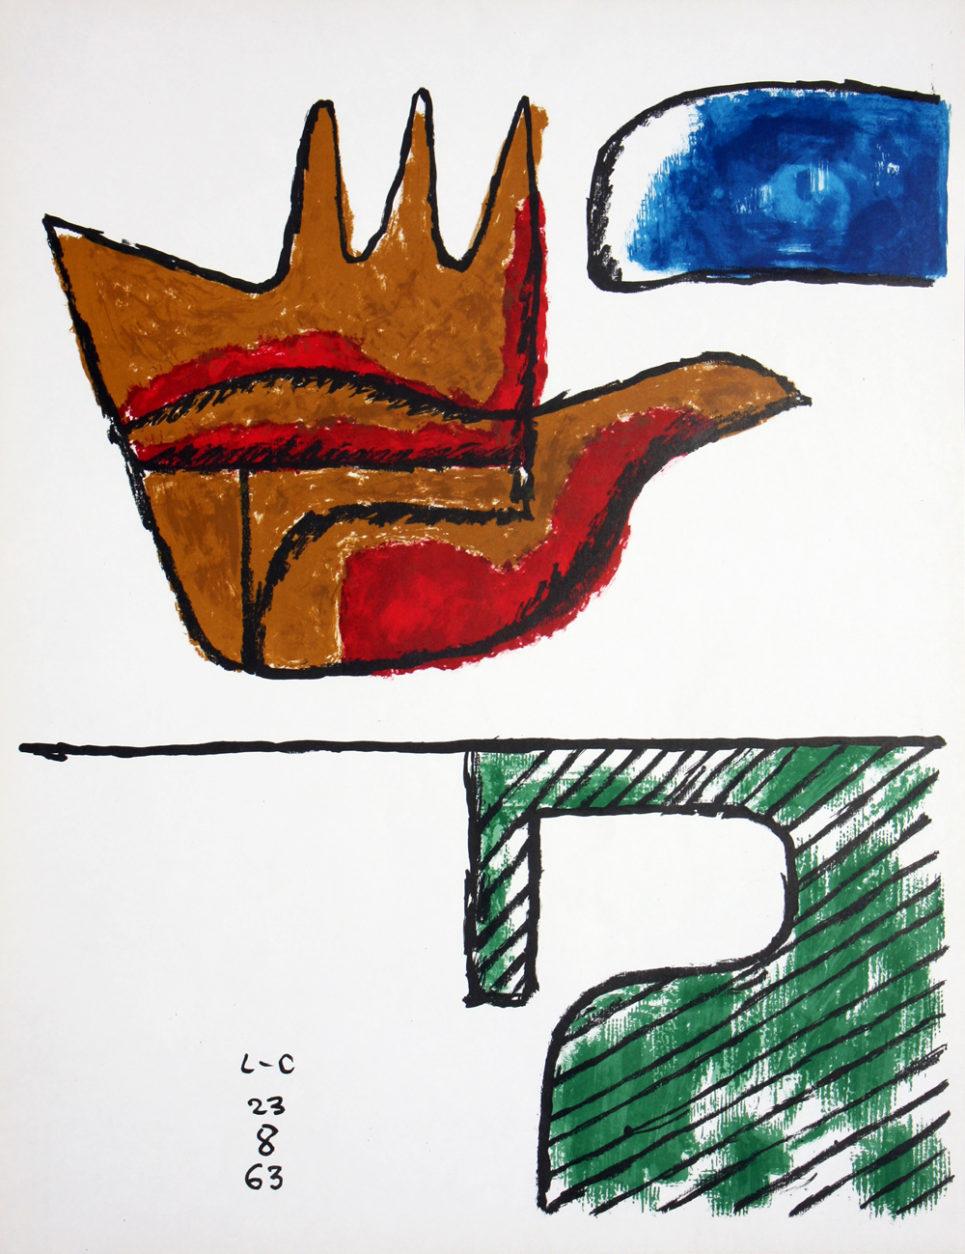 Le Corbusier - The Open Hand